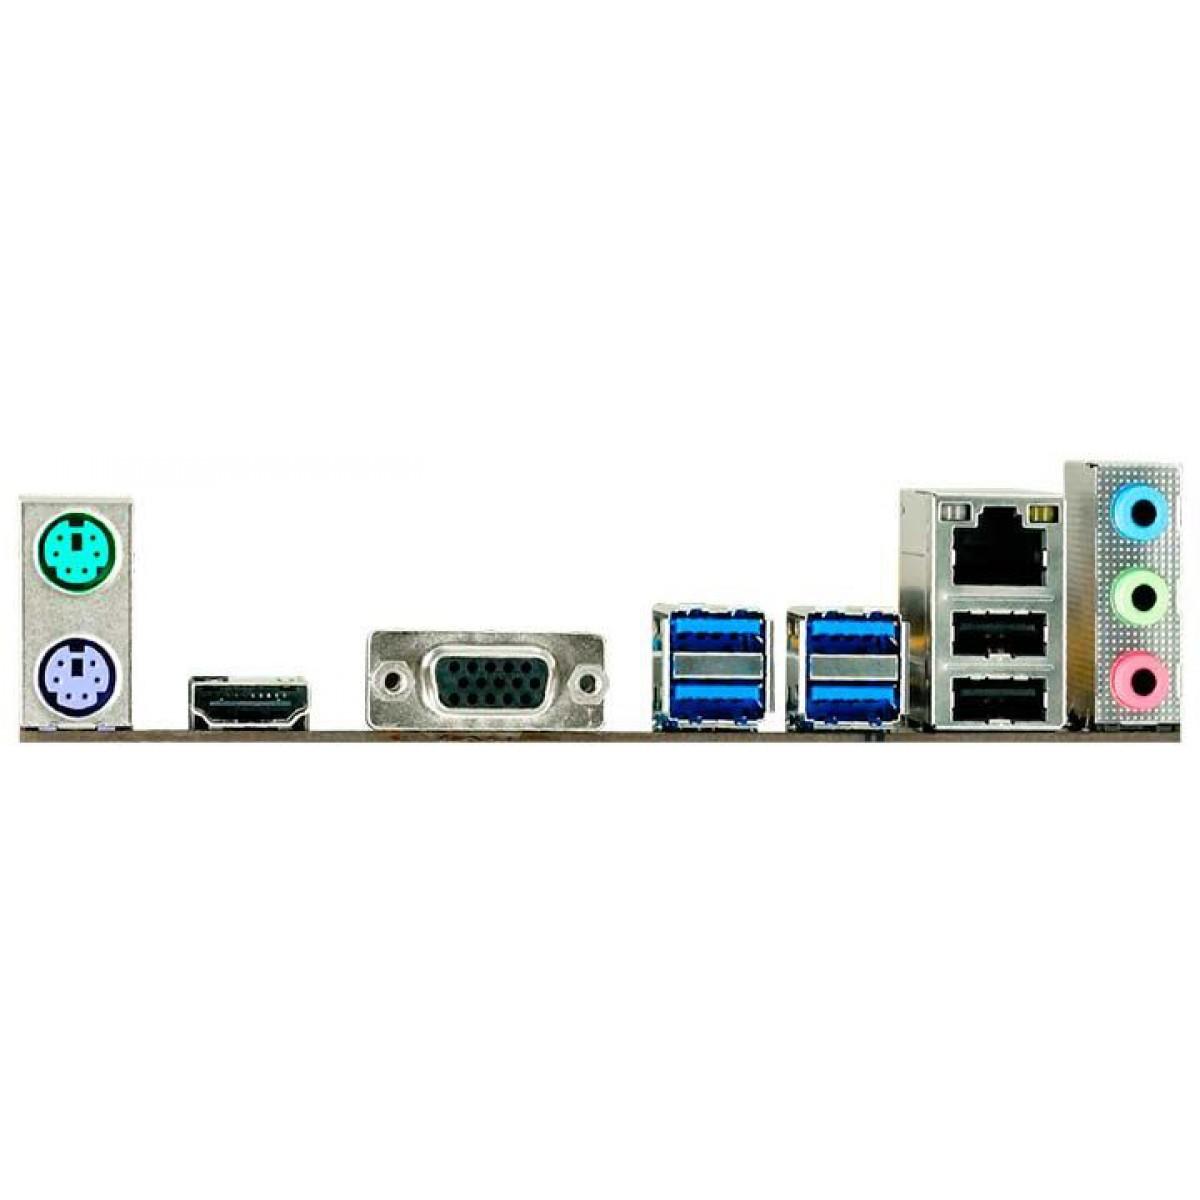 Placa Mãe Biostar B365MHC, Chipset B365, LGA 1151, DDR4